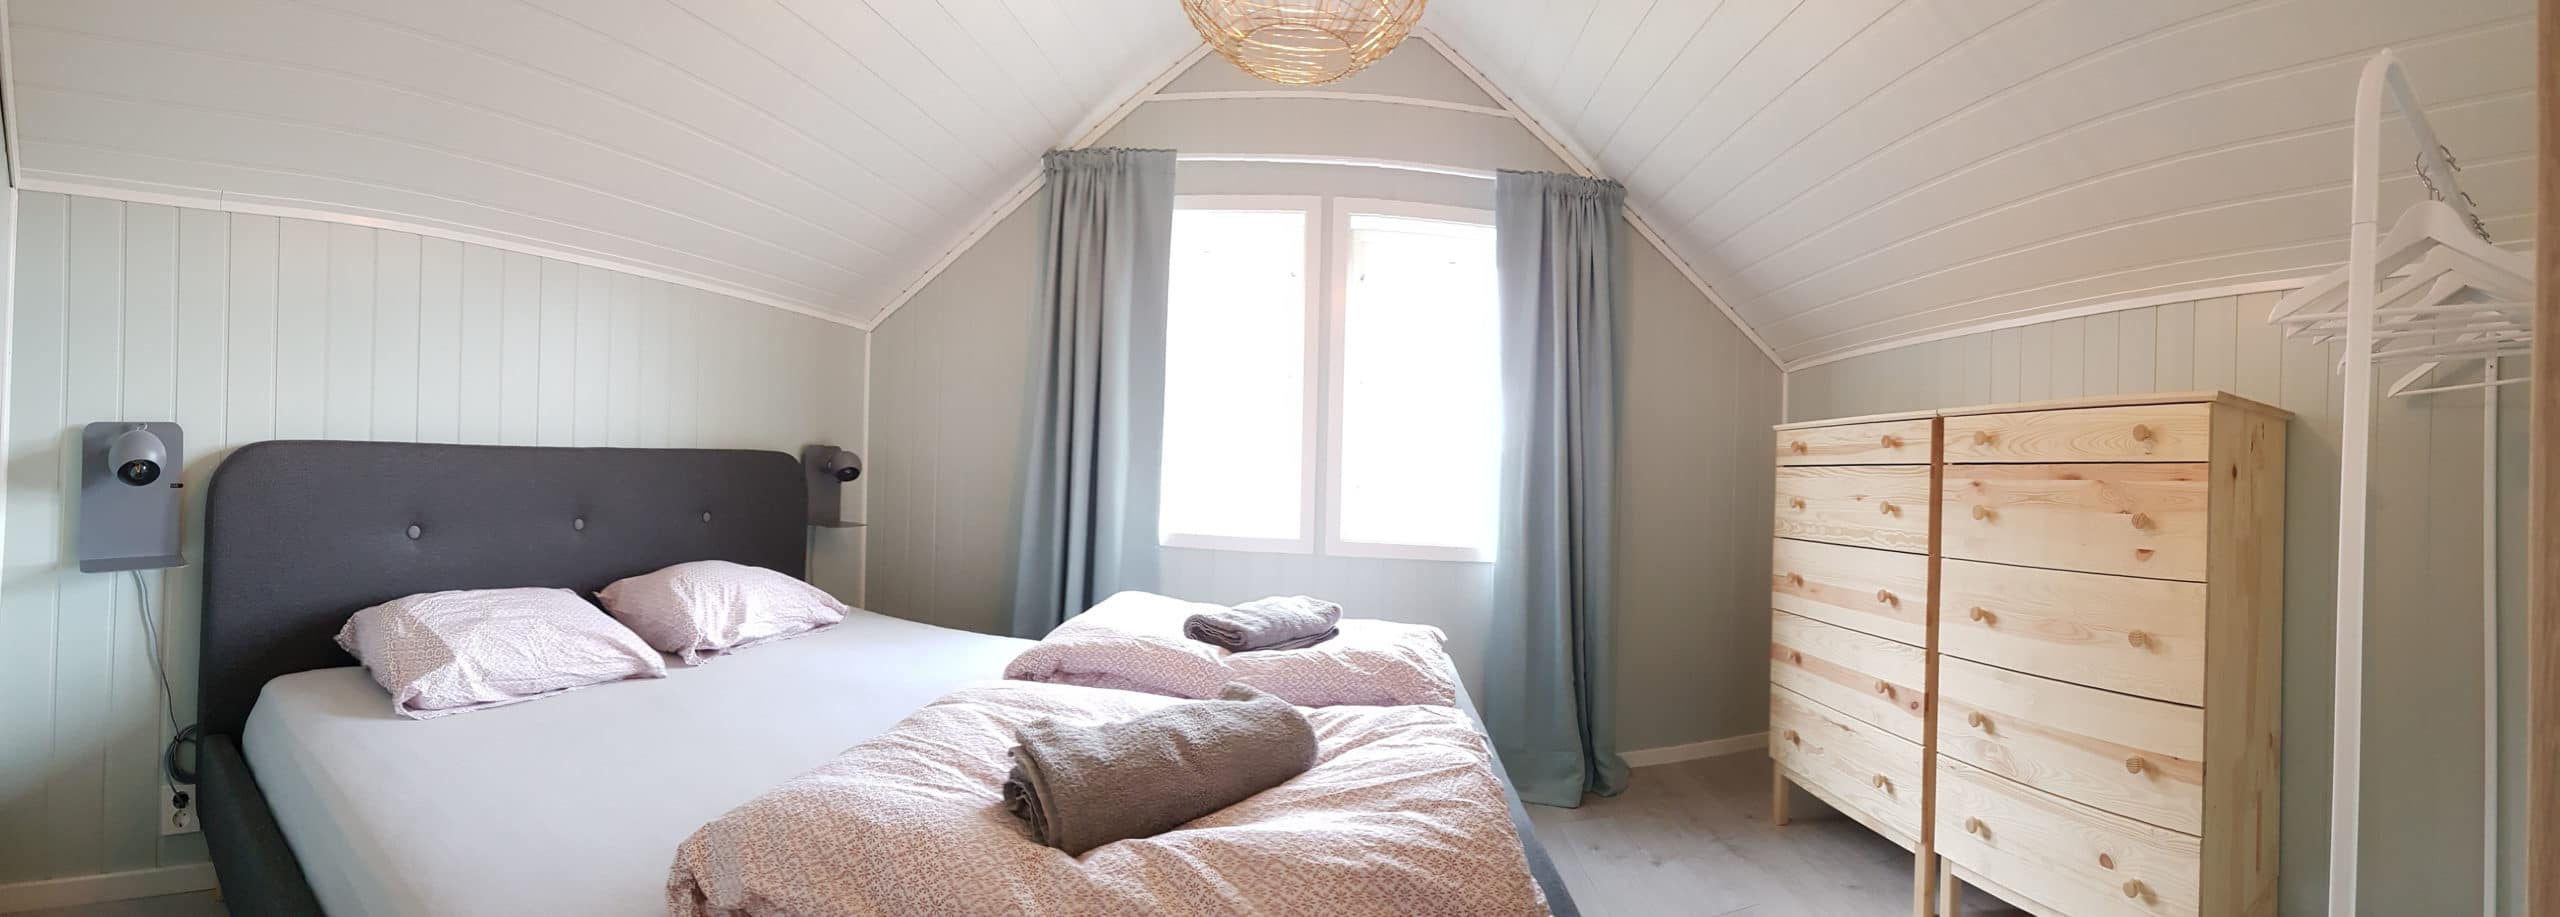 SanSelcabin Bedroom4